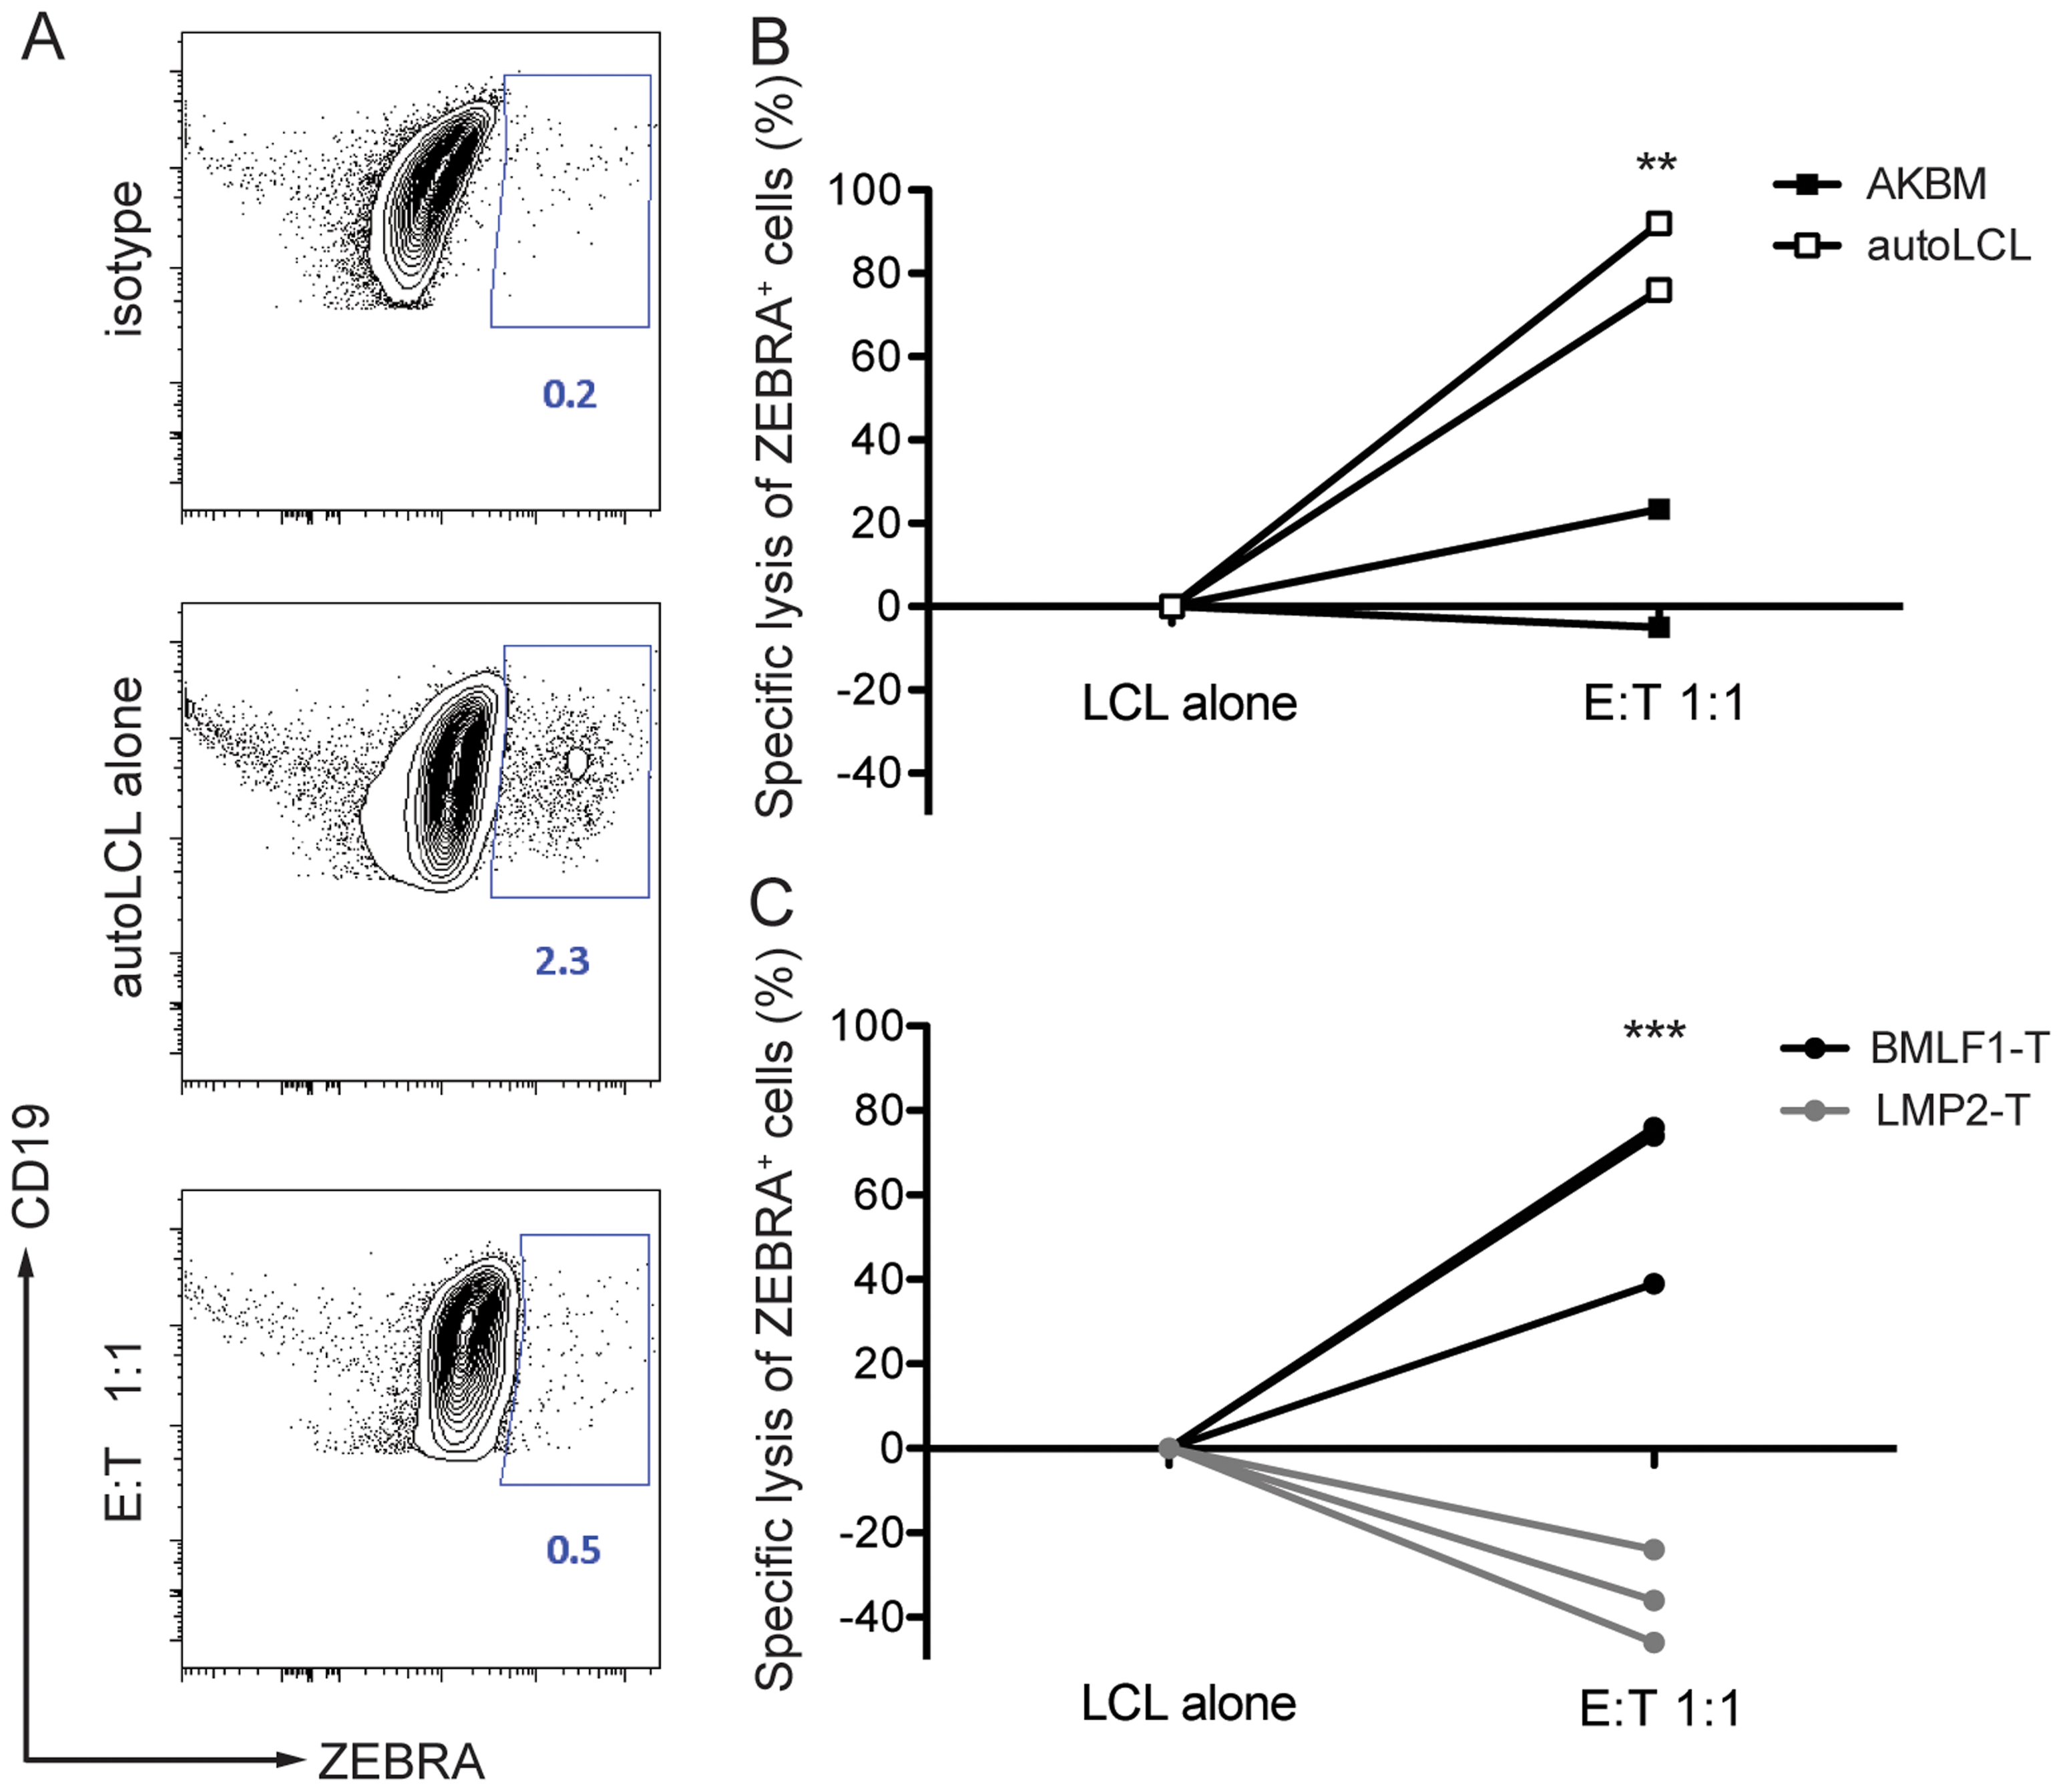 CD8<sup>+</sup> BMLF1-specific clones eliminate lytically replicating EBV transformed B cells <i>in vitro</i>.